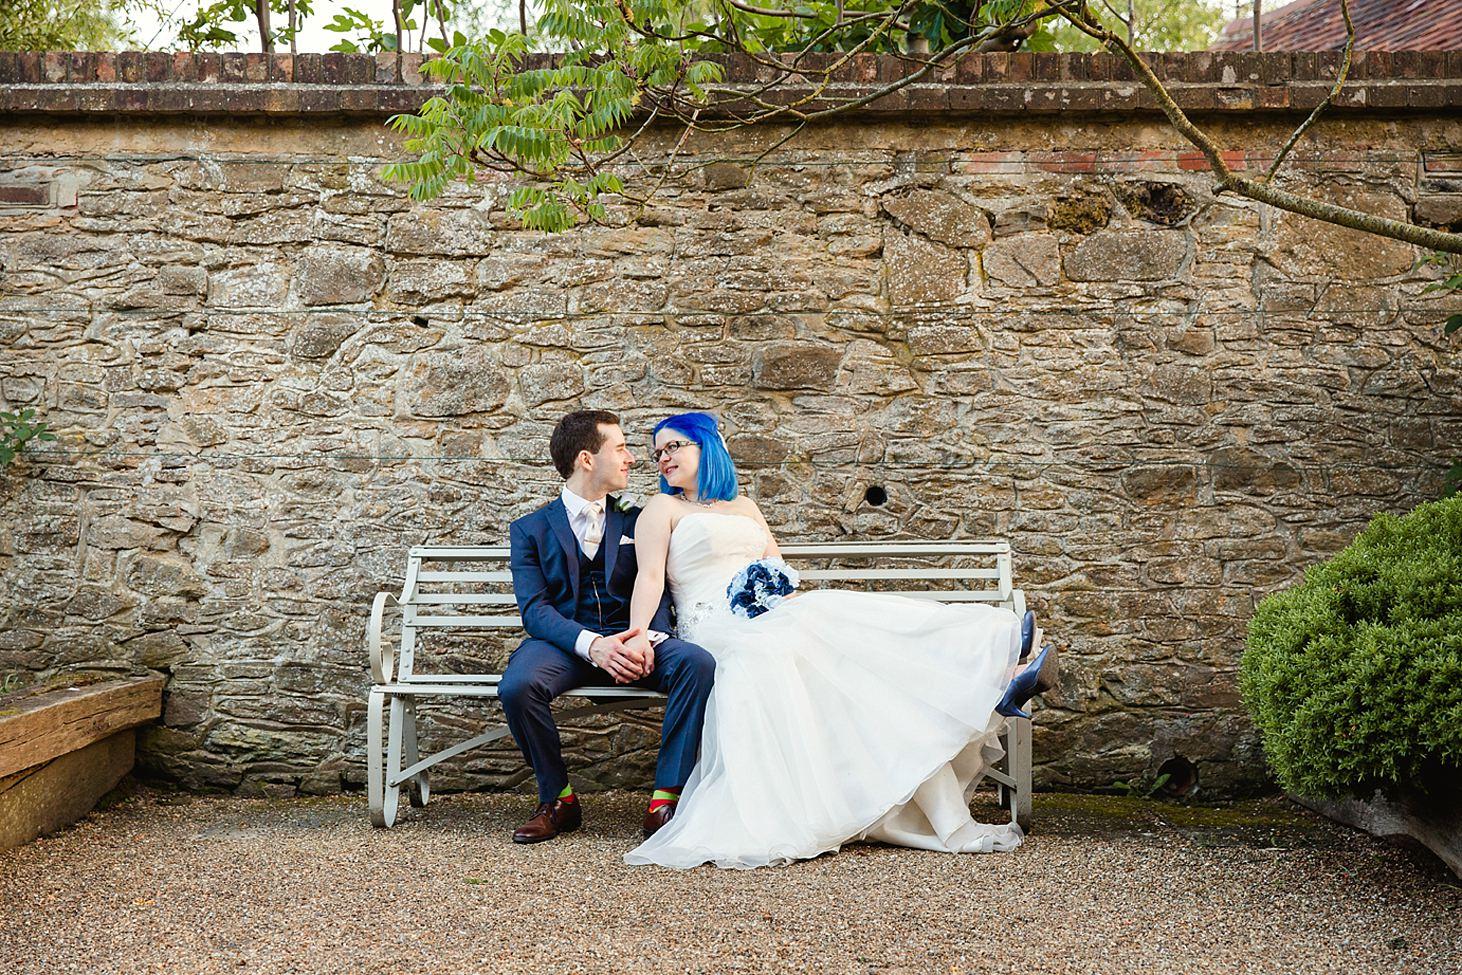 gate street barn wedding photography bride and groom sat on bench